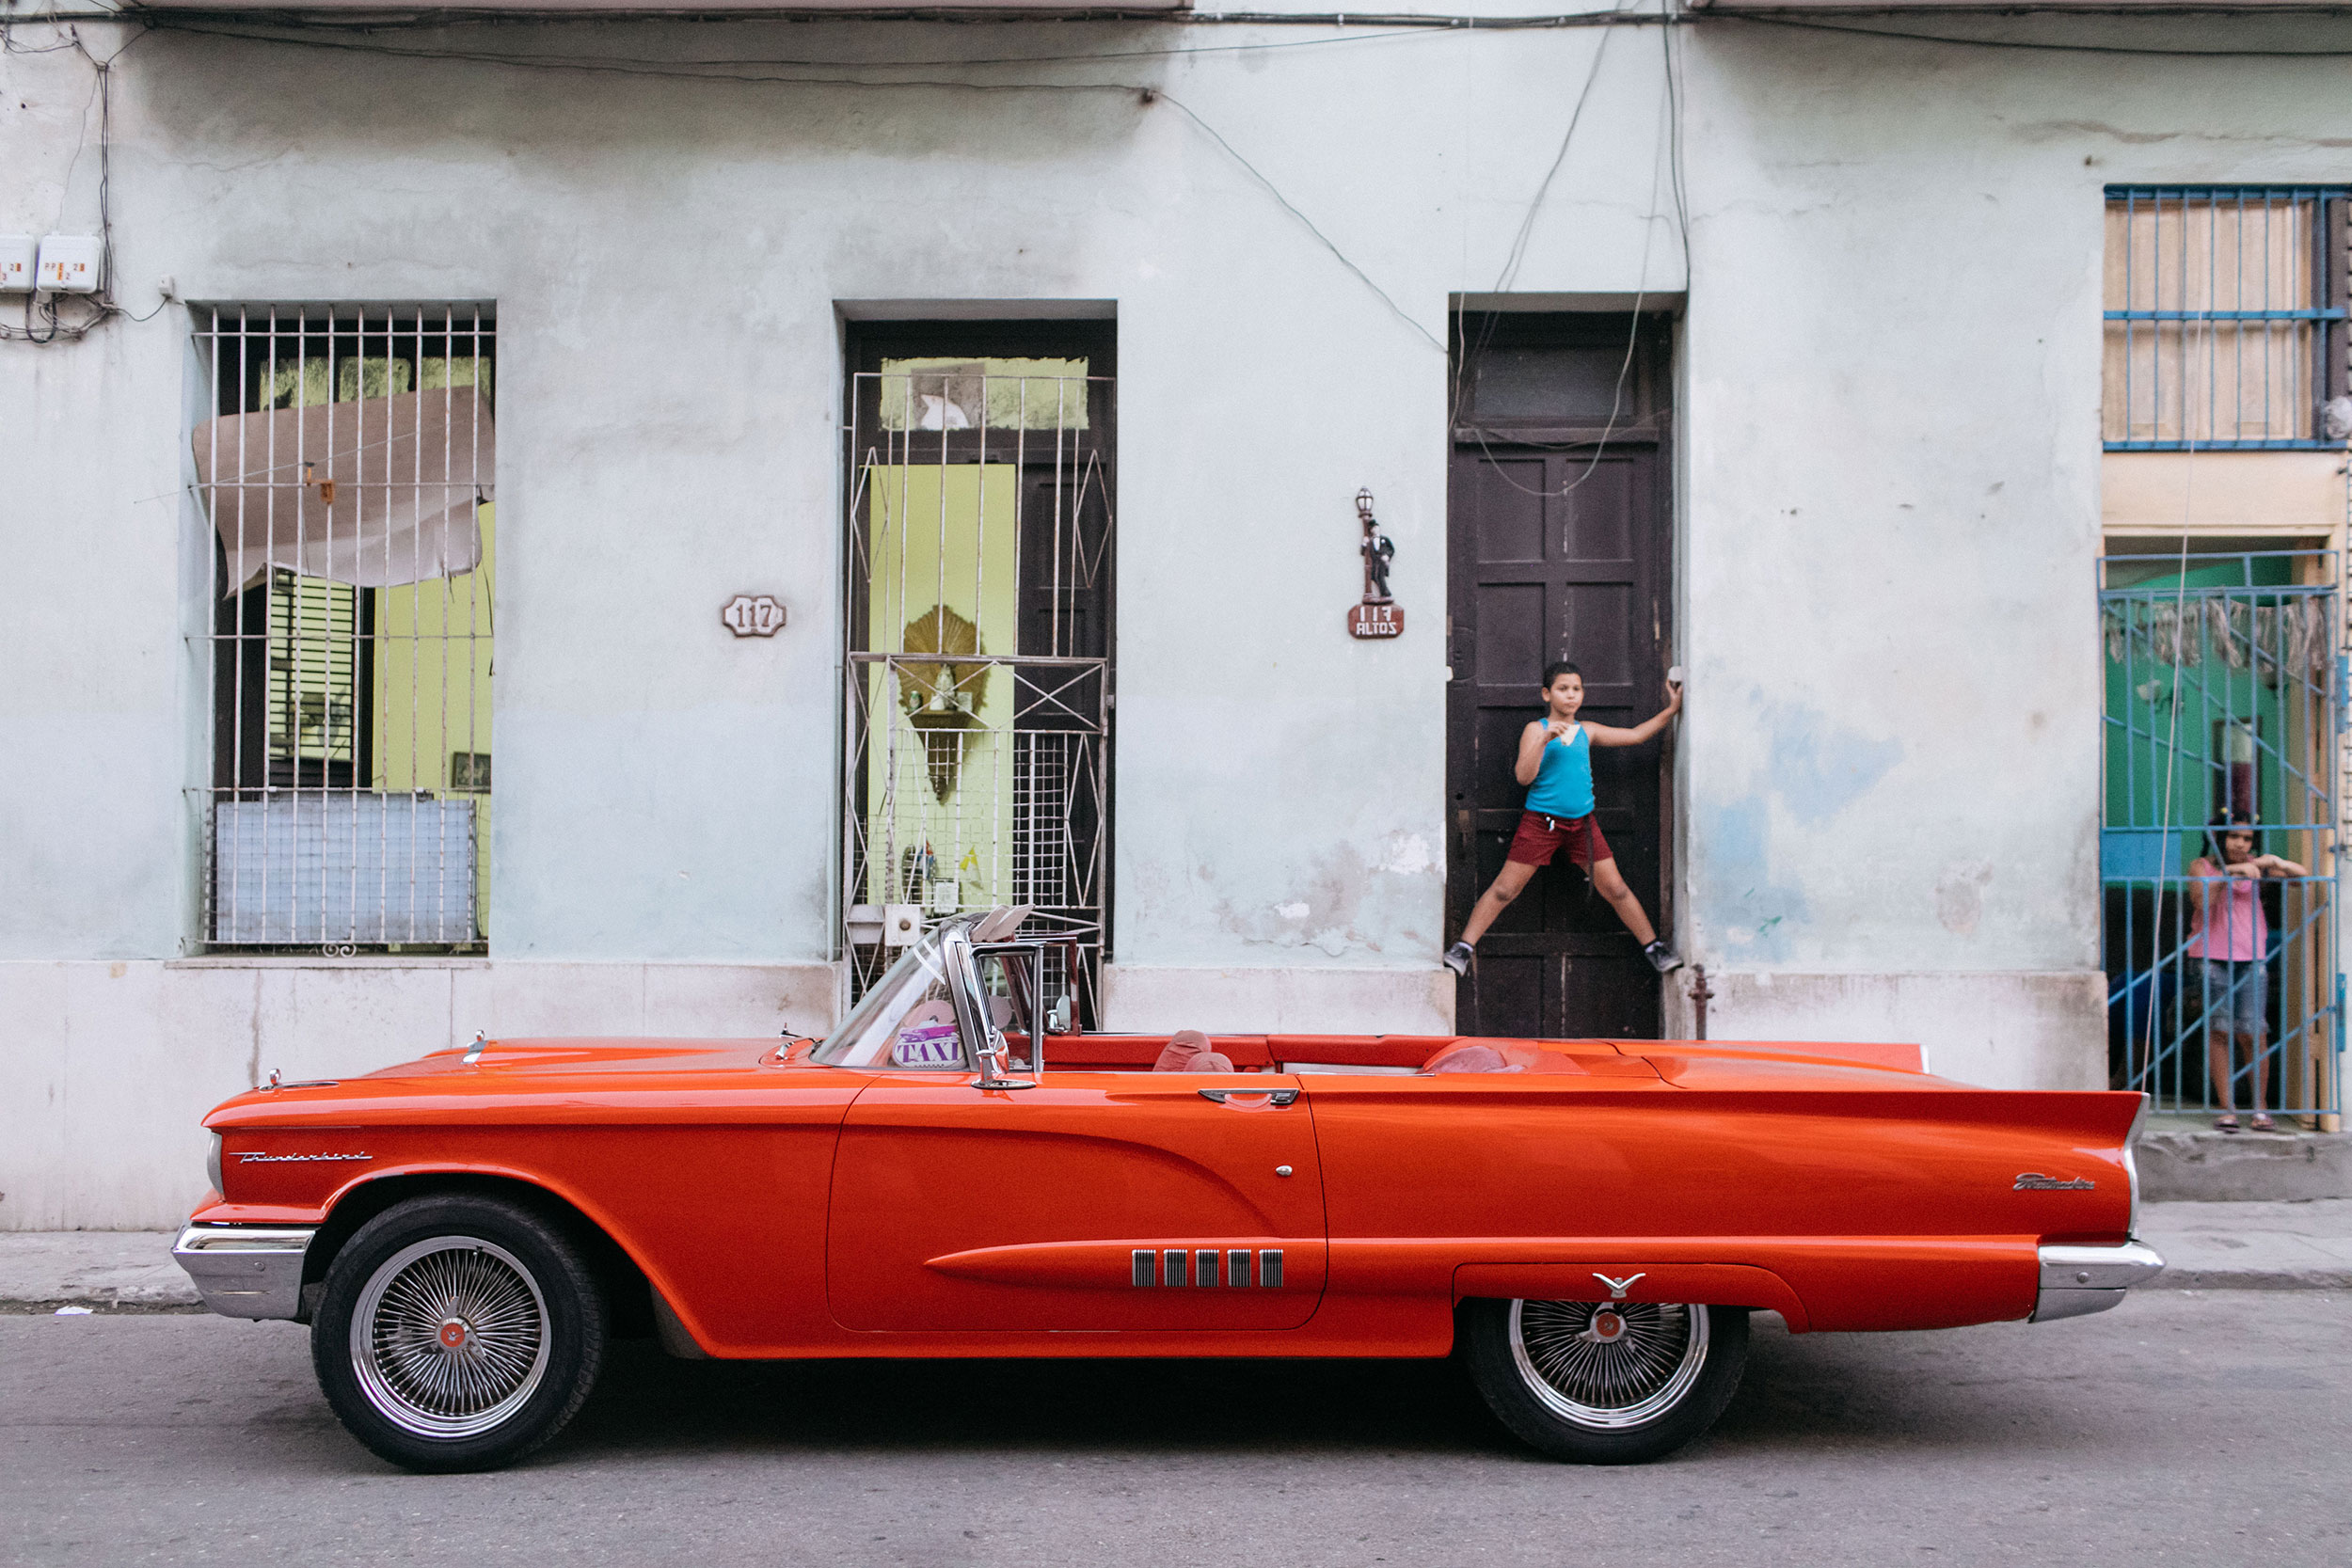 Cuba_MattPorteous_0052_3103.jpg